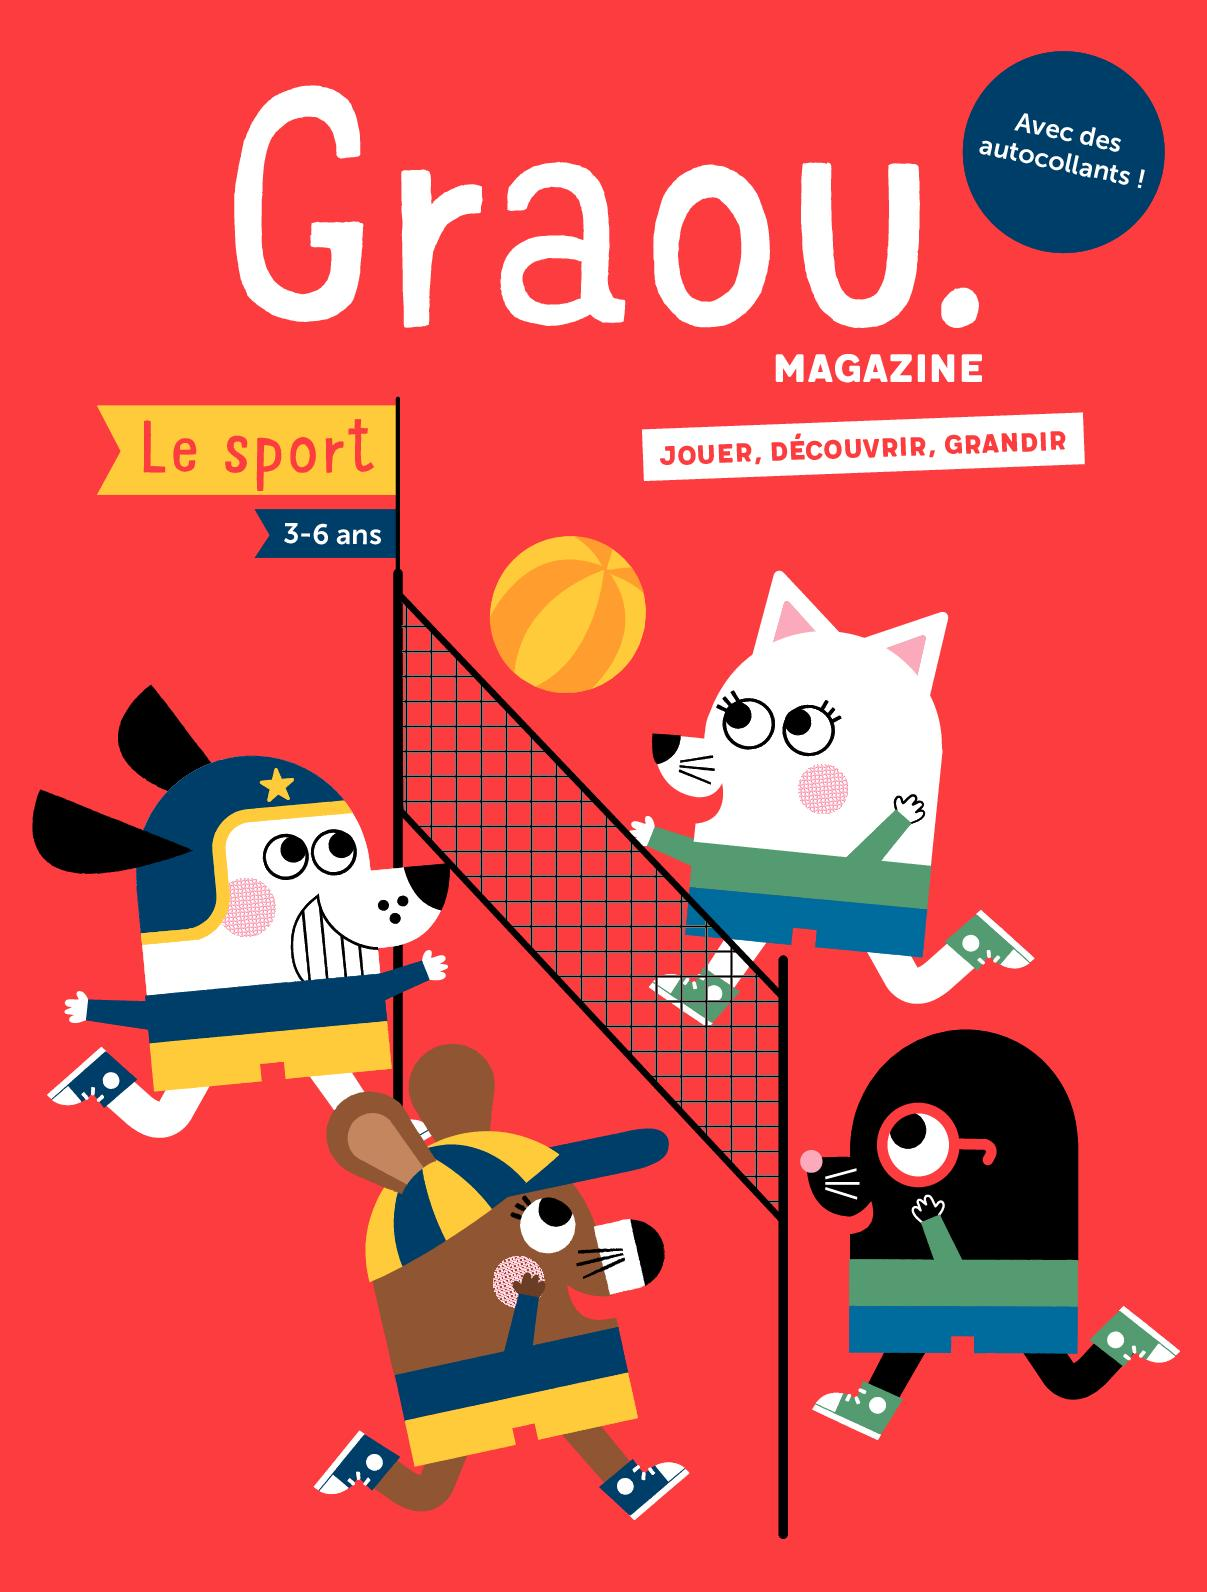 Graou N° Sport